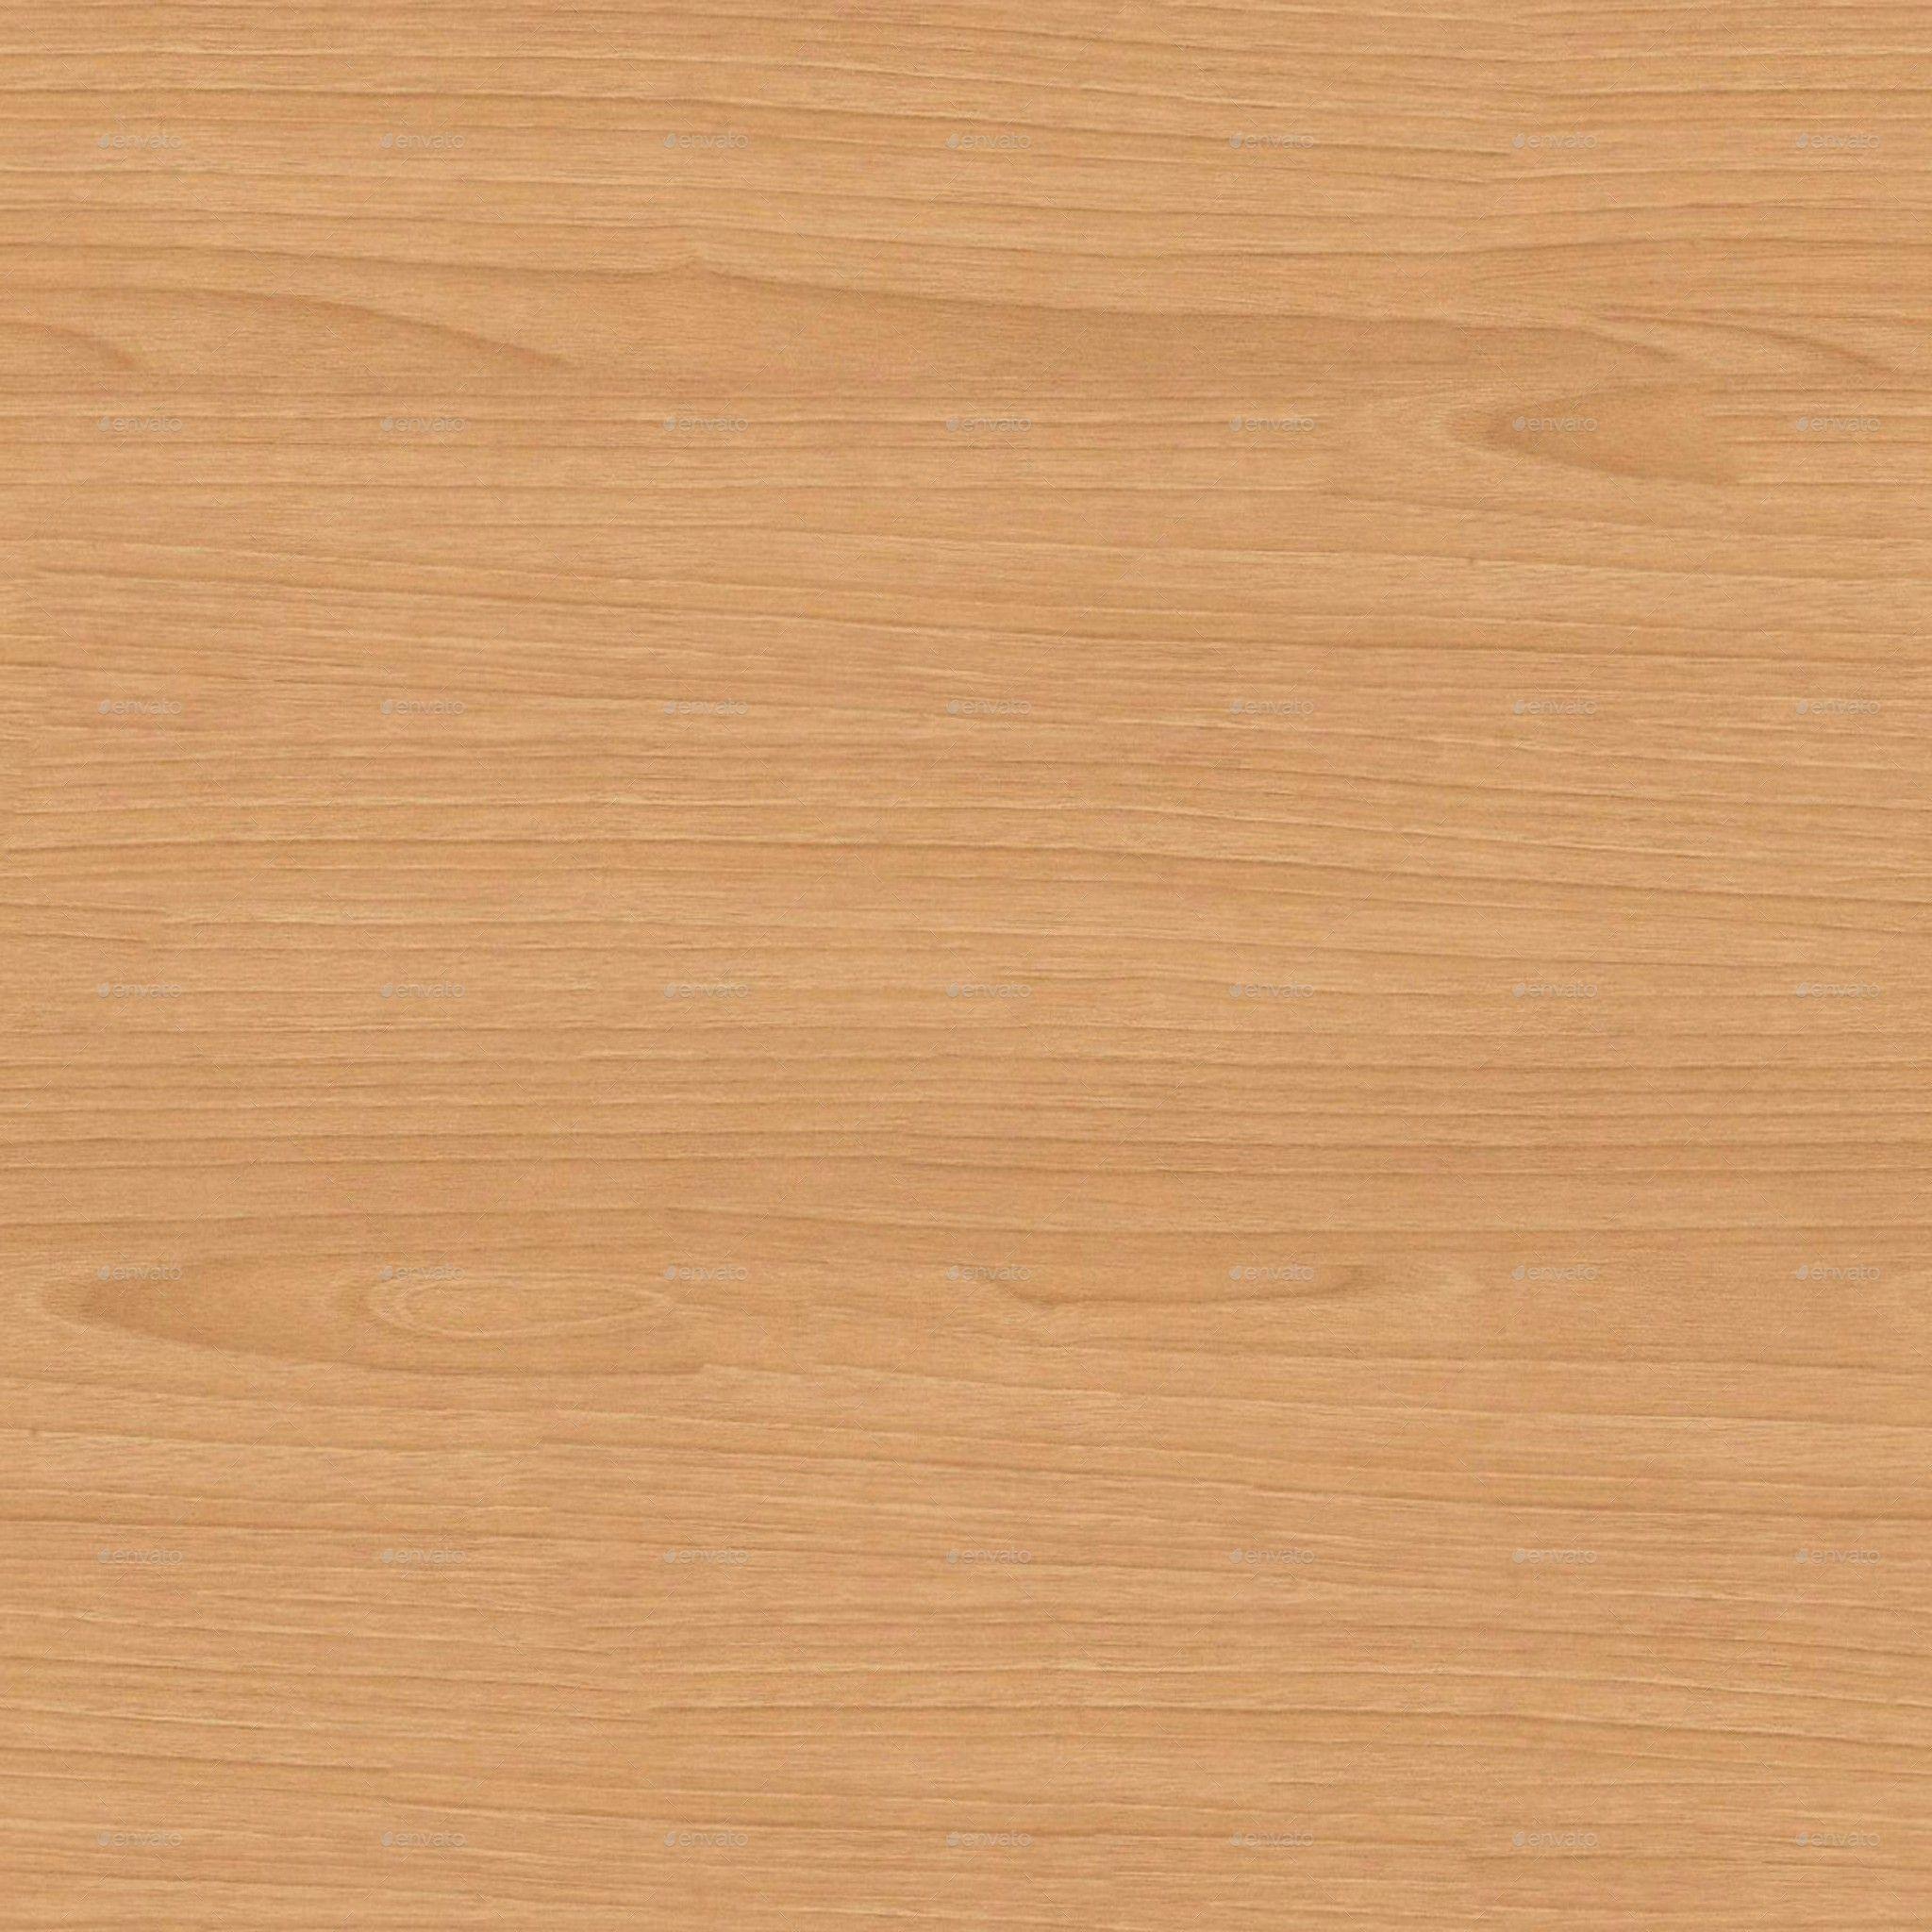 Fine Wood Seamless Texture Set Volume 1 Light Wood Texture Wood Texture Seamless Wood Floor Texture